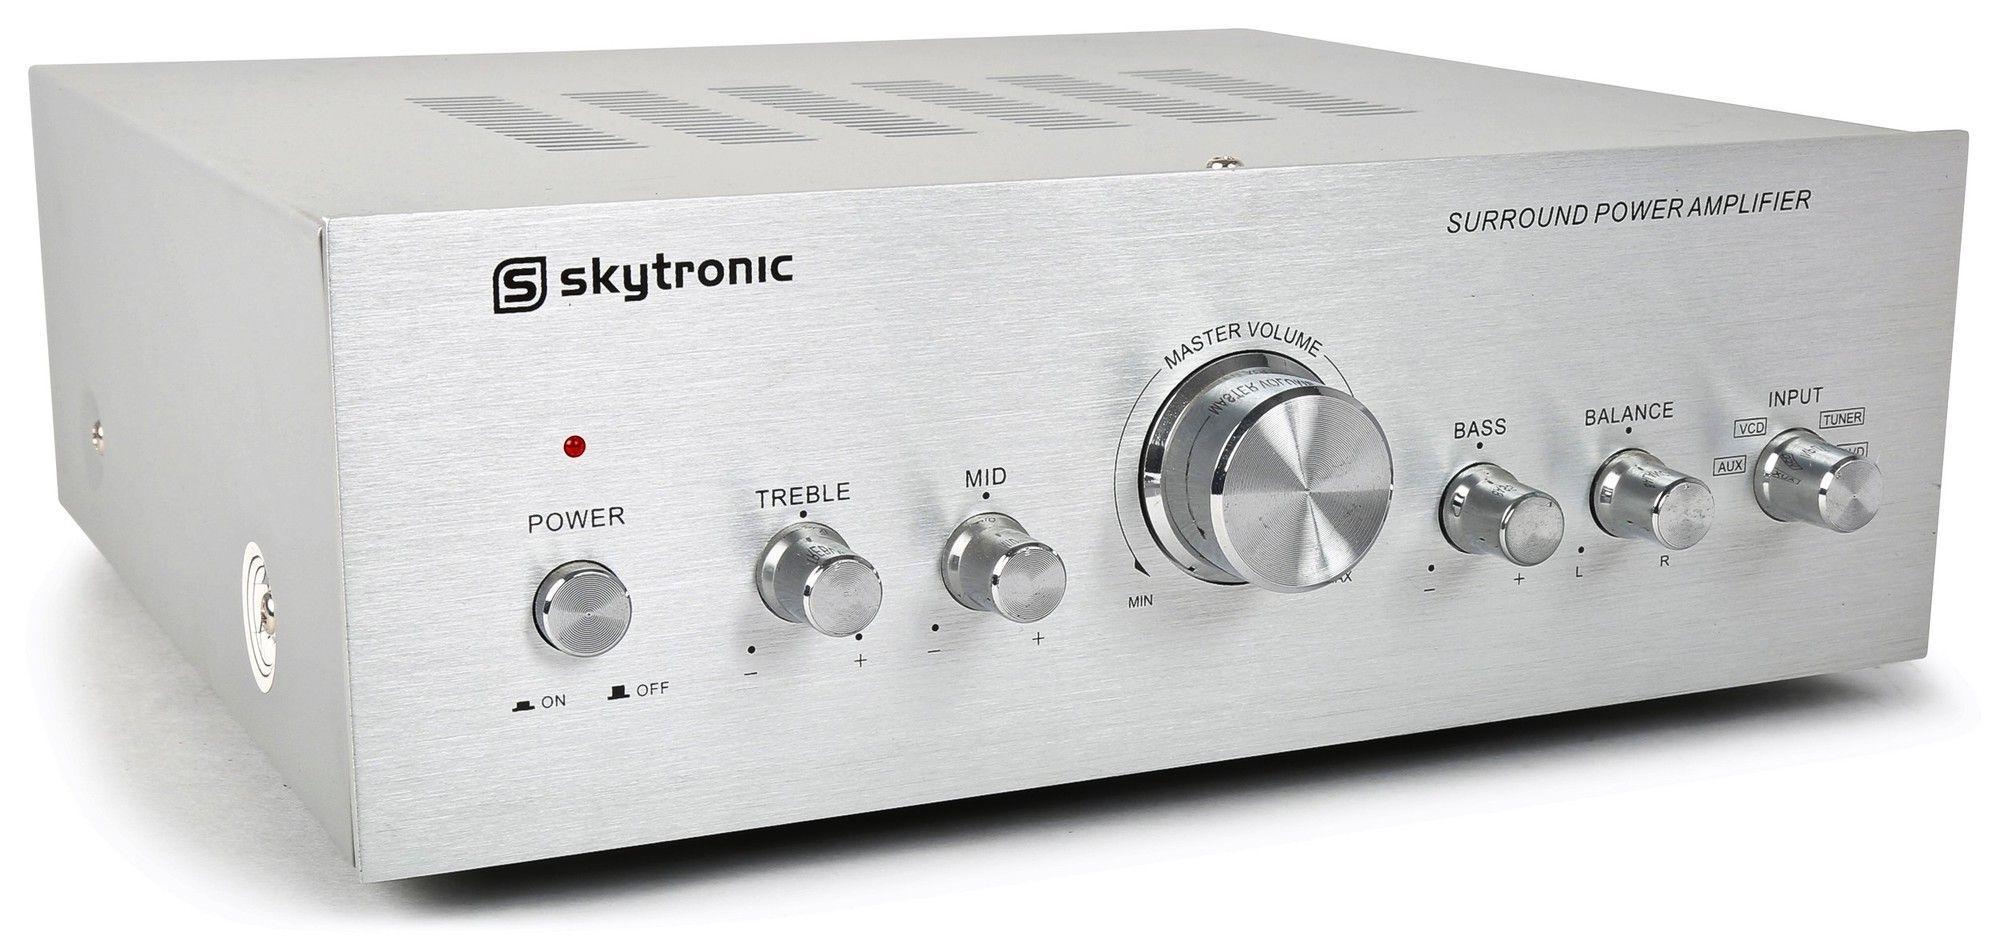 Dagaanbieding - Skytronic-Stereo-versterker-400W-met-4-inputs dagelijkse koopjes